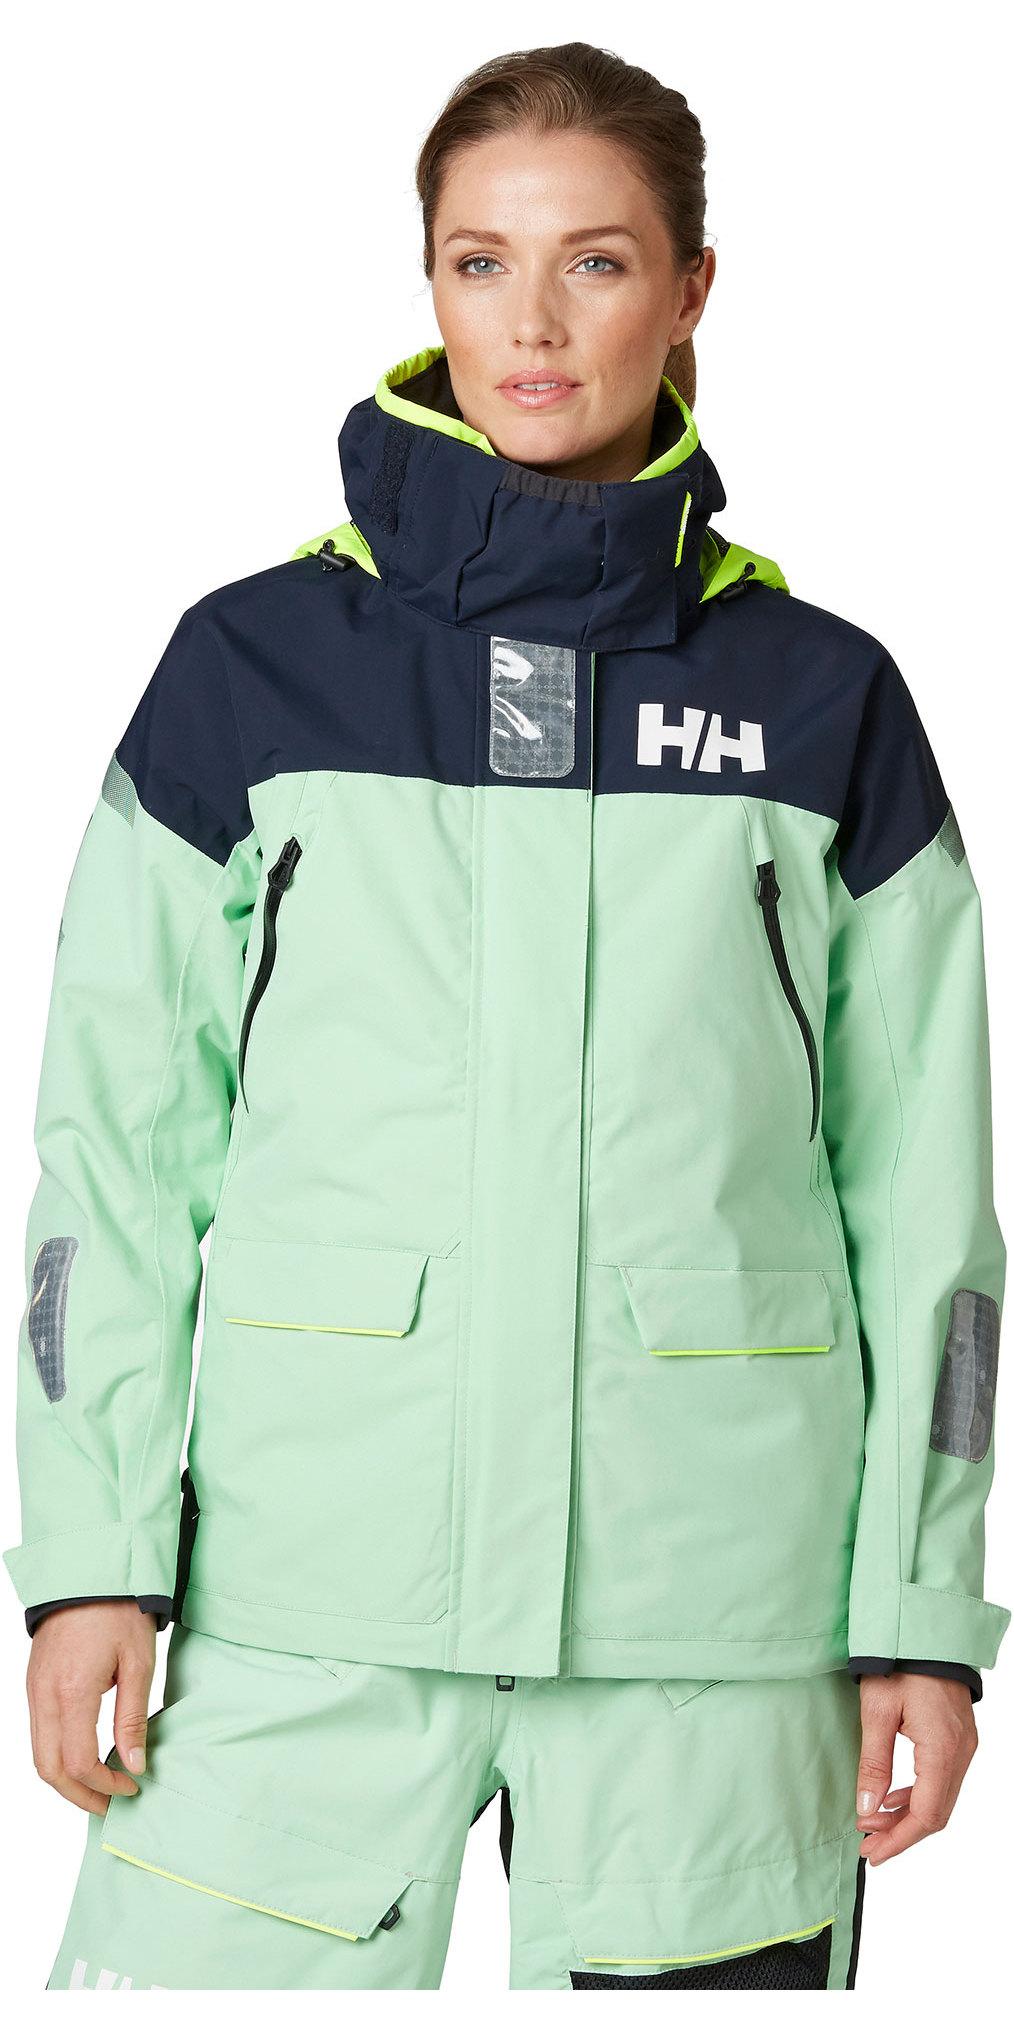 2020 Helly Hansen Skagen Offshore Jakke Navy 33920 Seiling